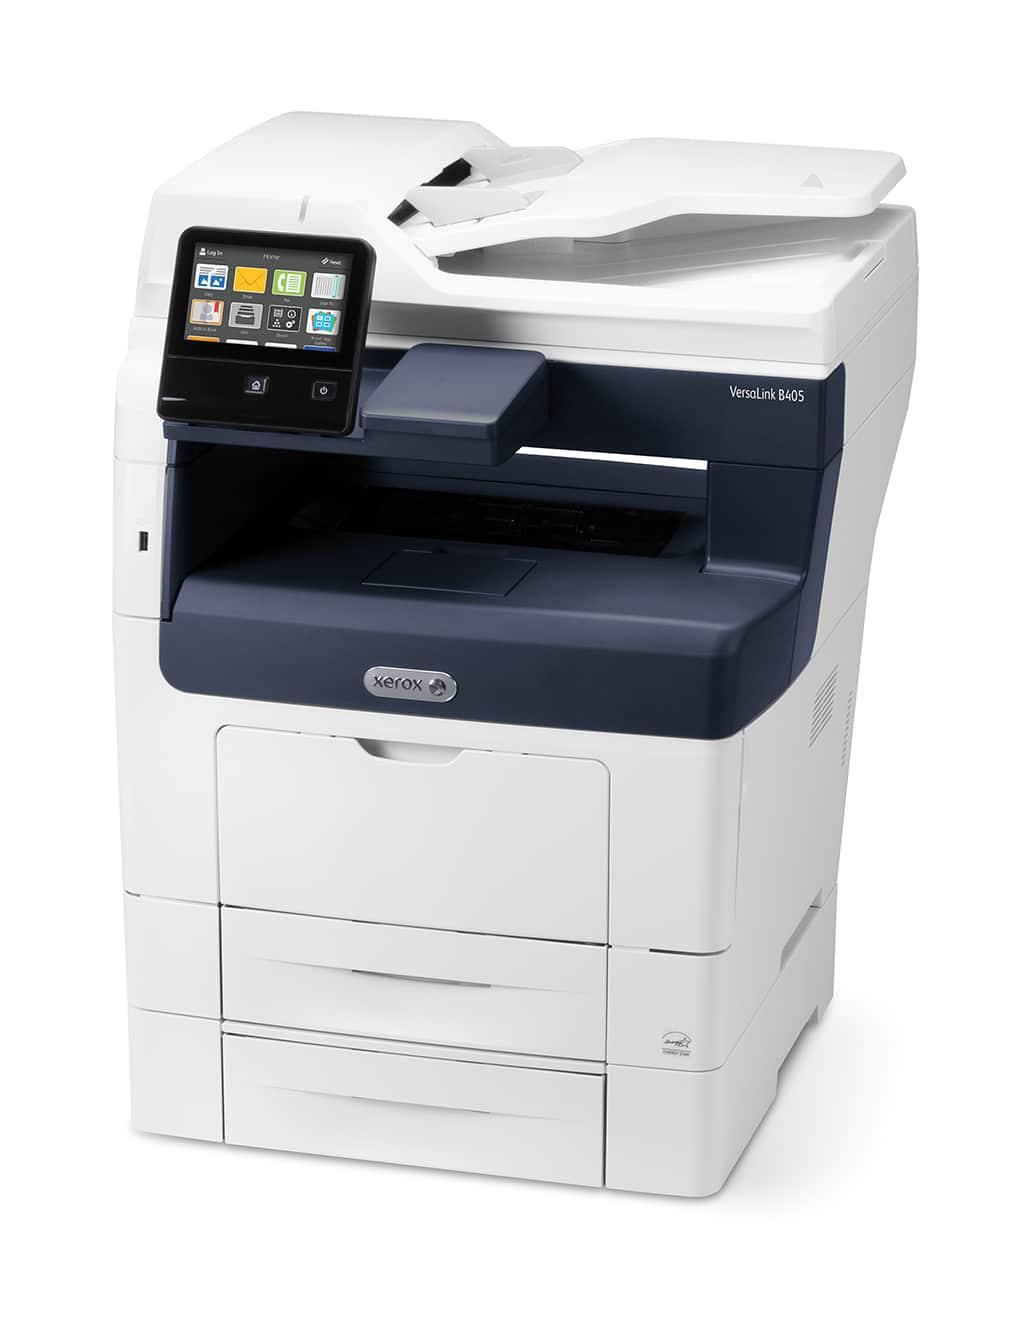 Impresora multifunción Xerox VersaLink B405